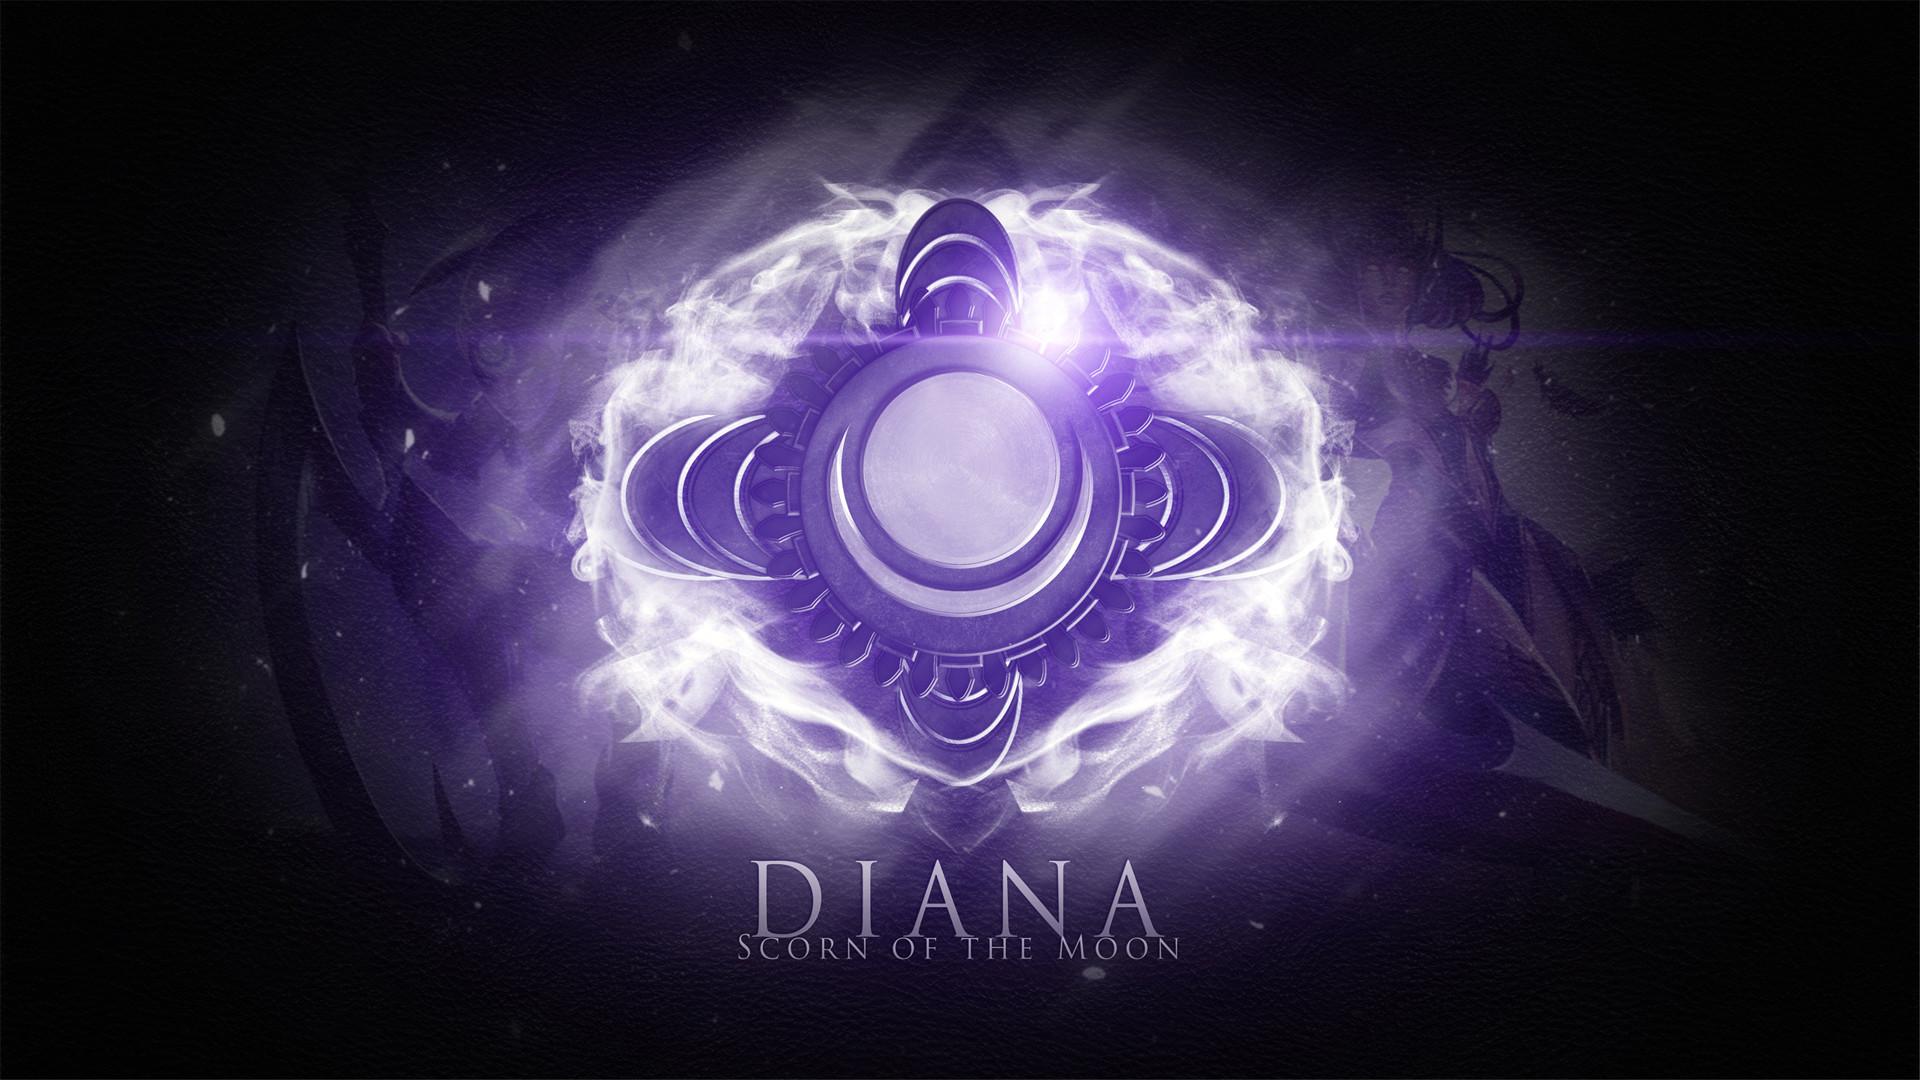 Diana logo icon League of Legends